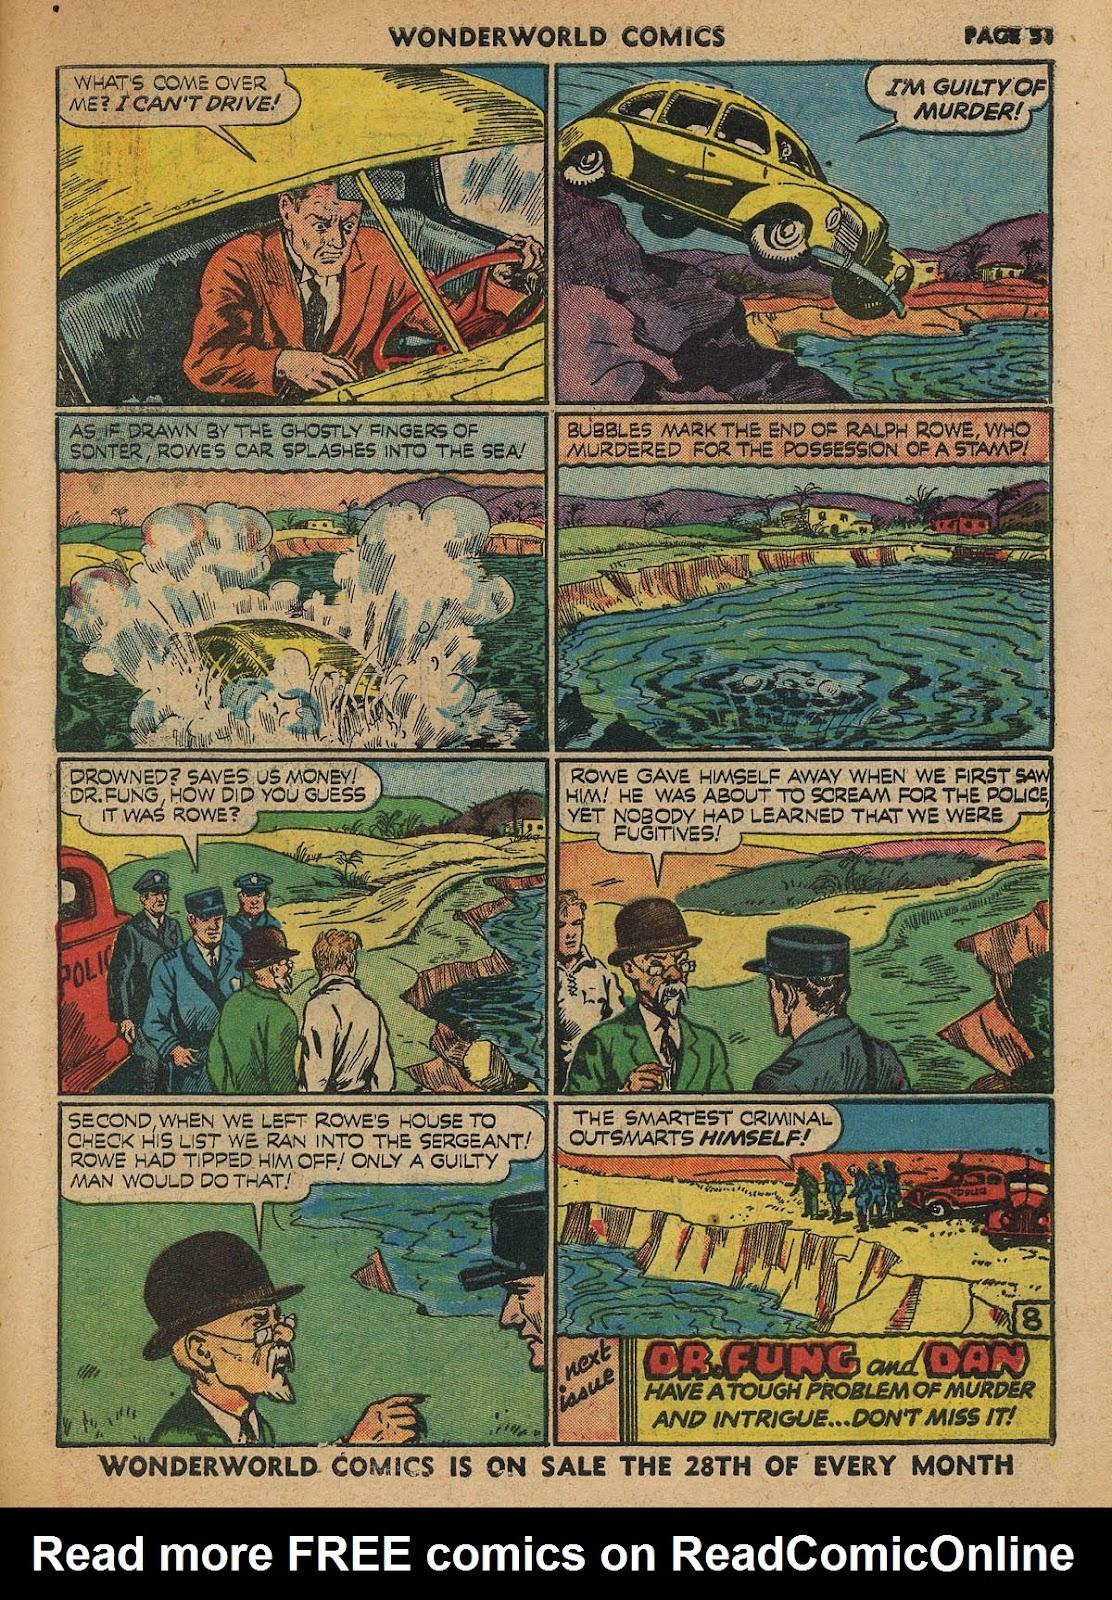 Wonderworld Comics issue 23 - Page 52